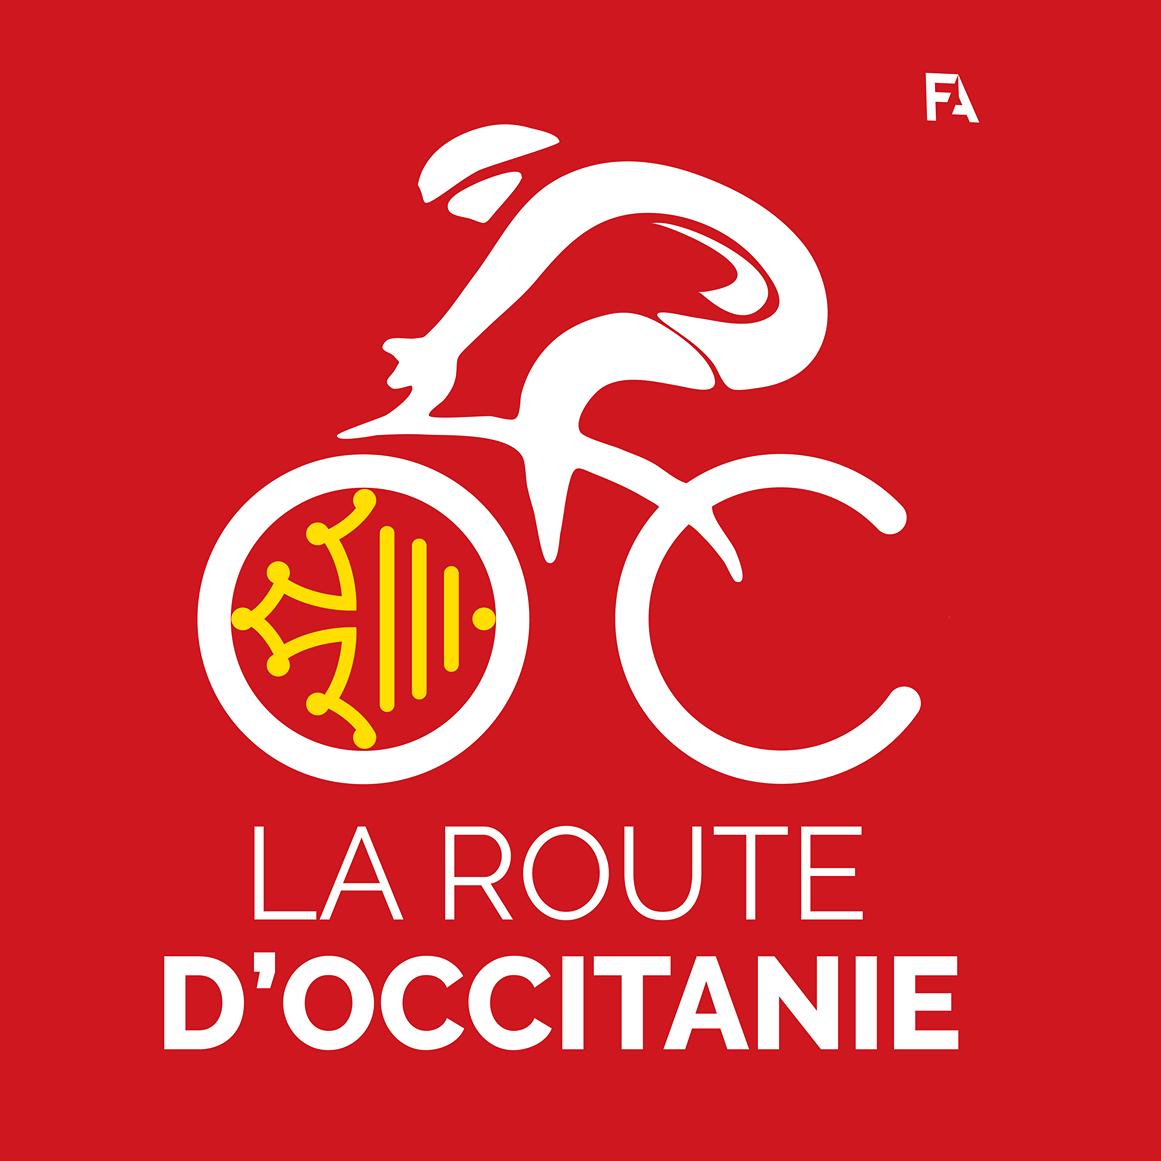 http://www.laroutedoccitanie.fr